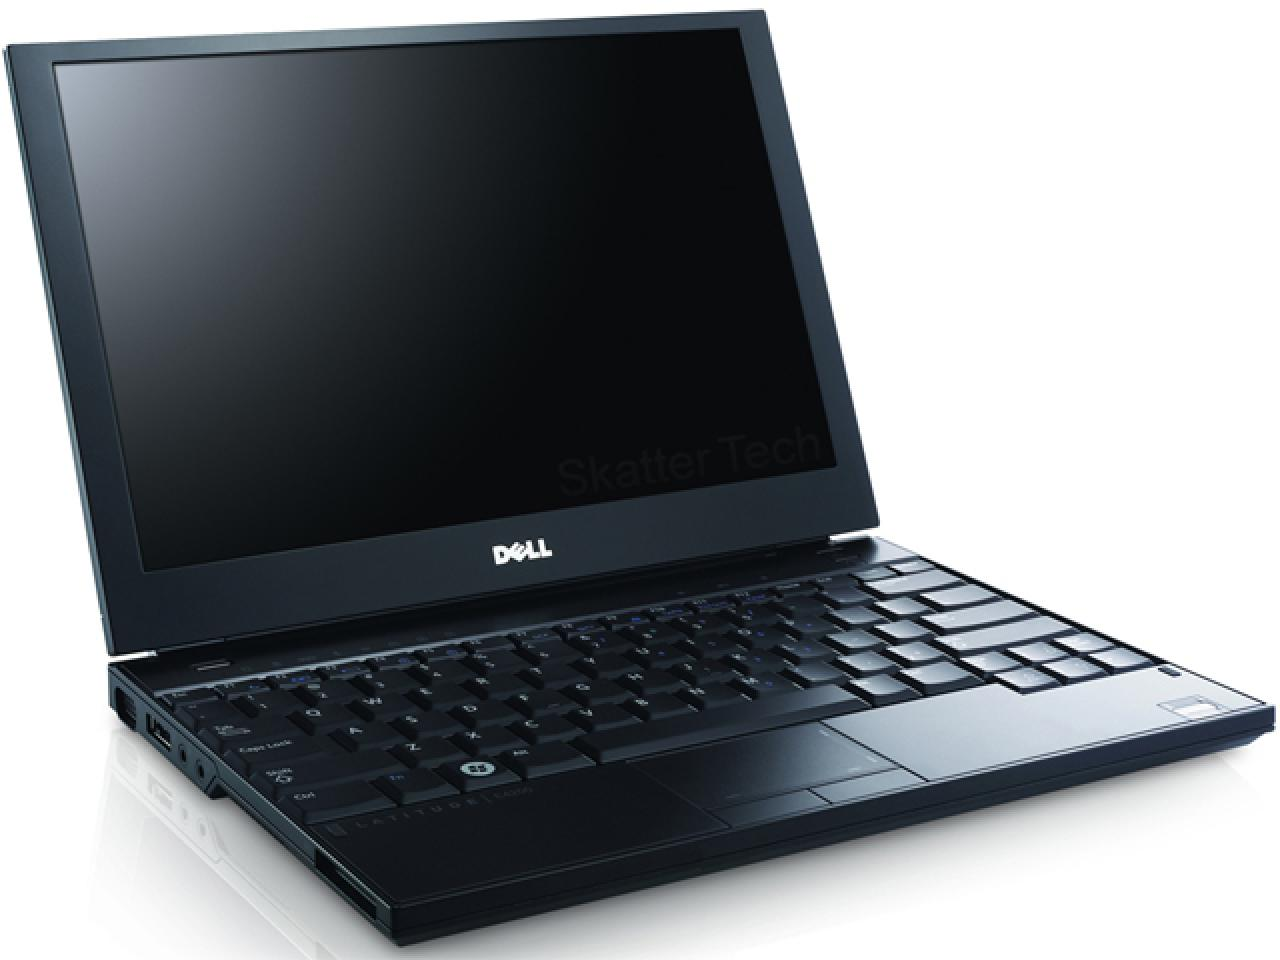 Dell Latitude E6400  - shop.bb-net.de